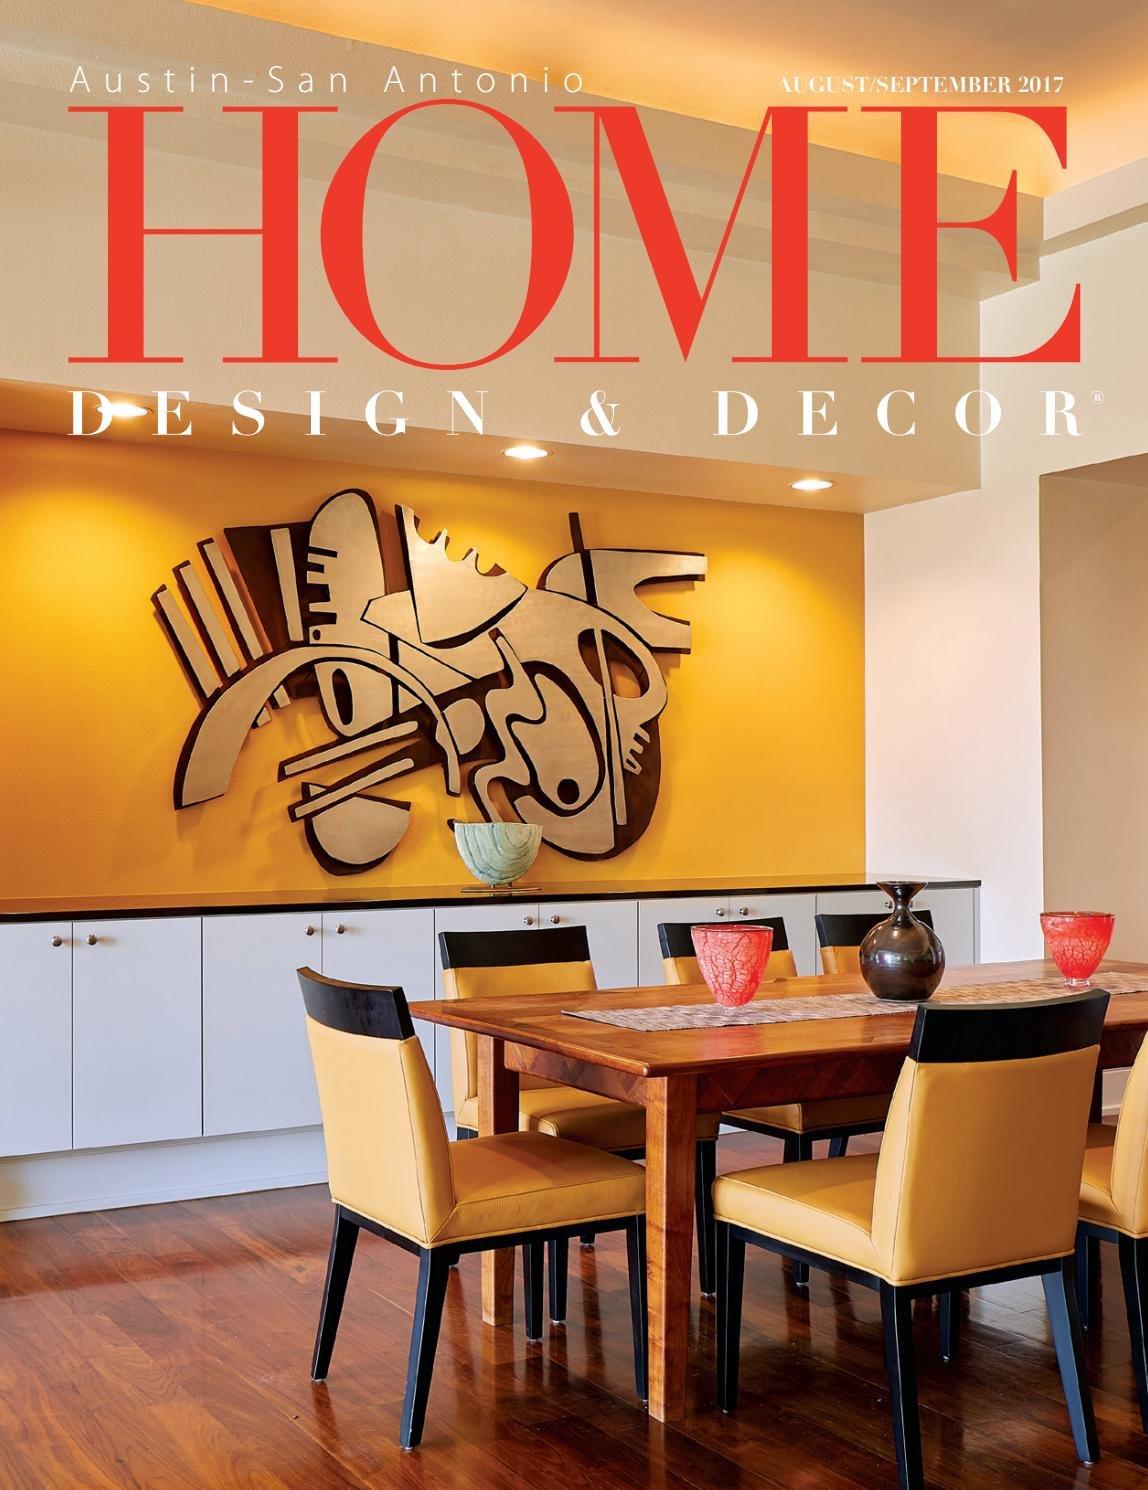 World Of Decor San Antonio Beautiful Home Design & Decor Austin San Antonio August Septemeber 2017 by Trisha Doucette issuu